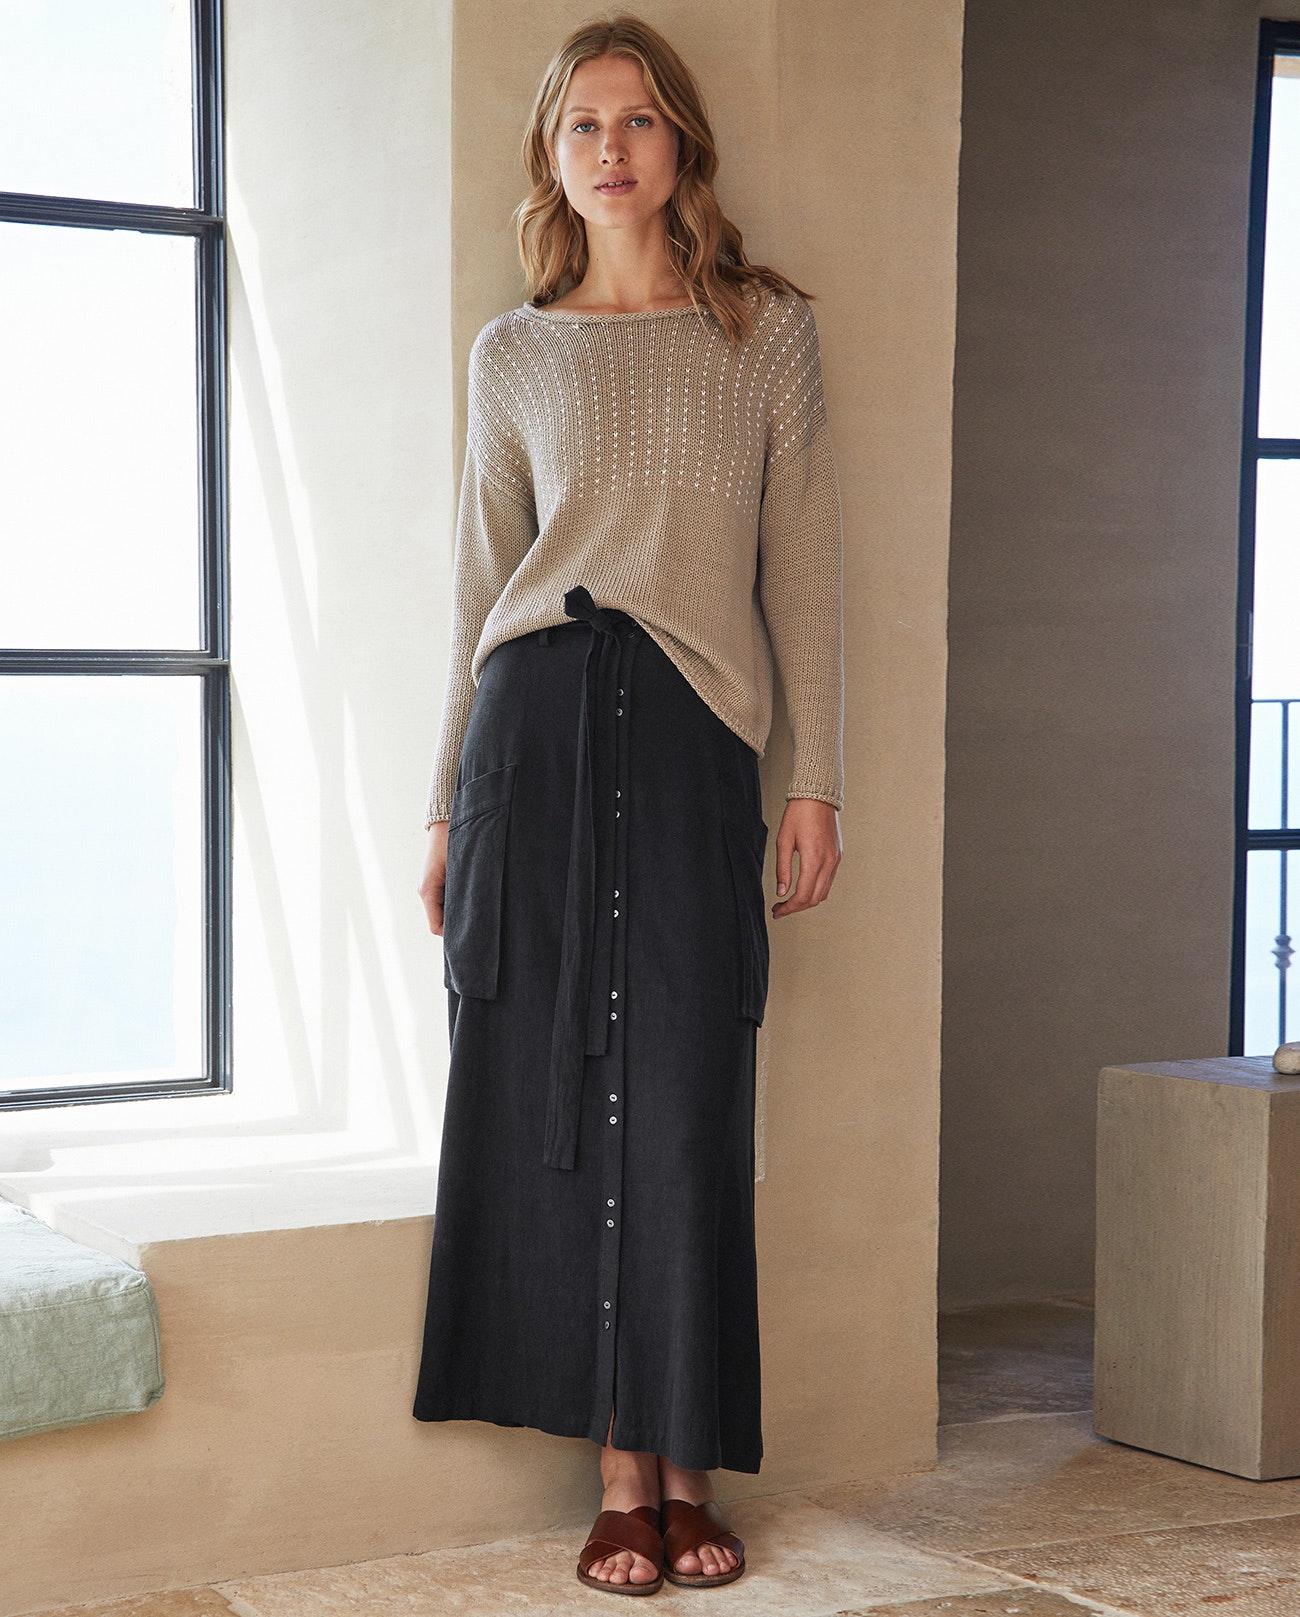 af9aeb915f2 ... Image of Utility maxi skirt ...